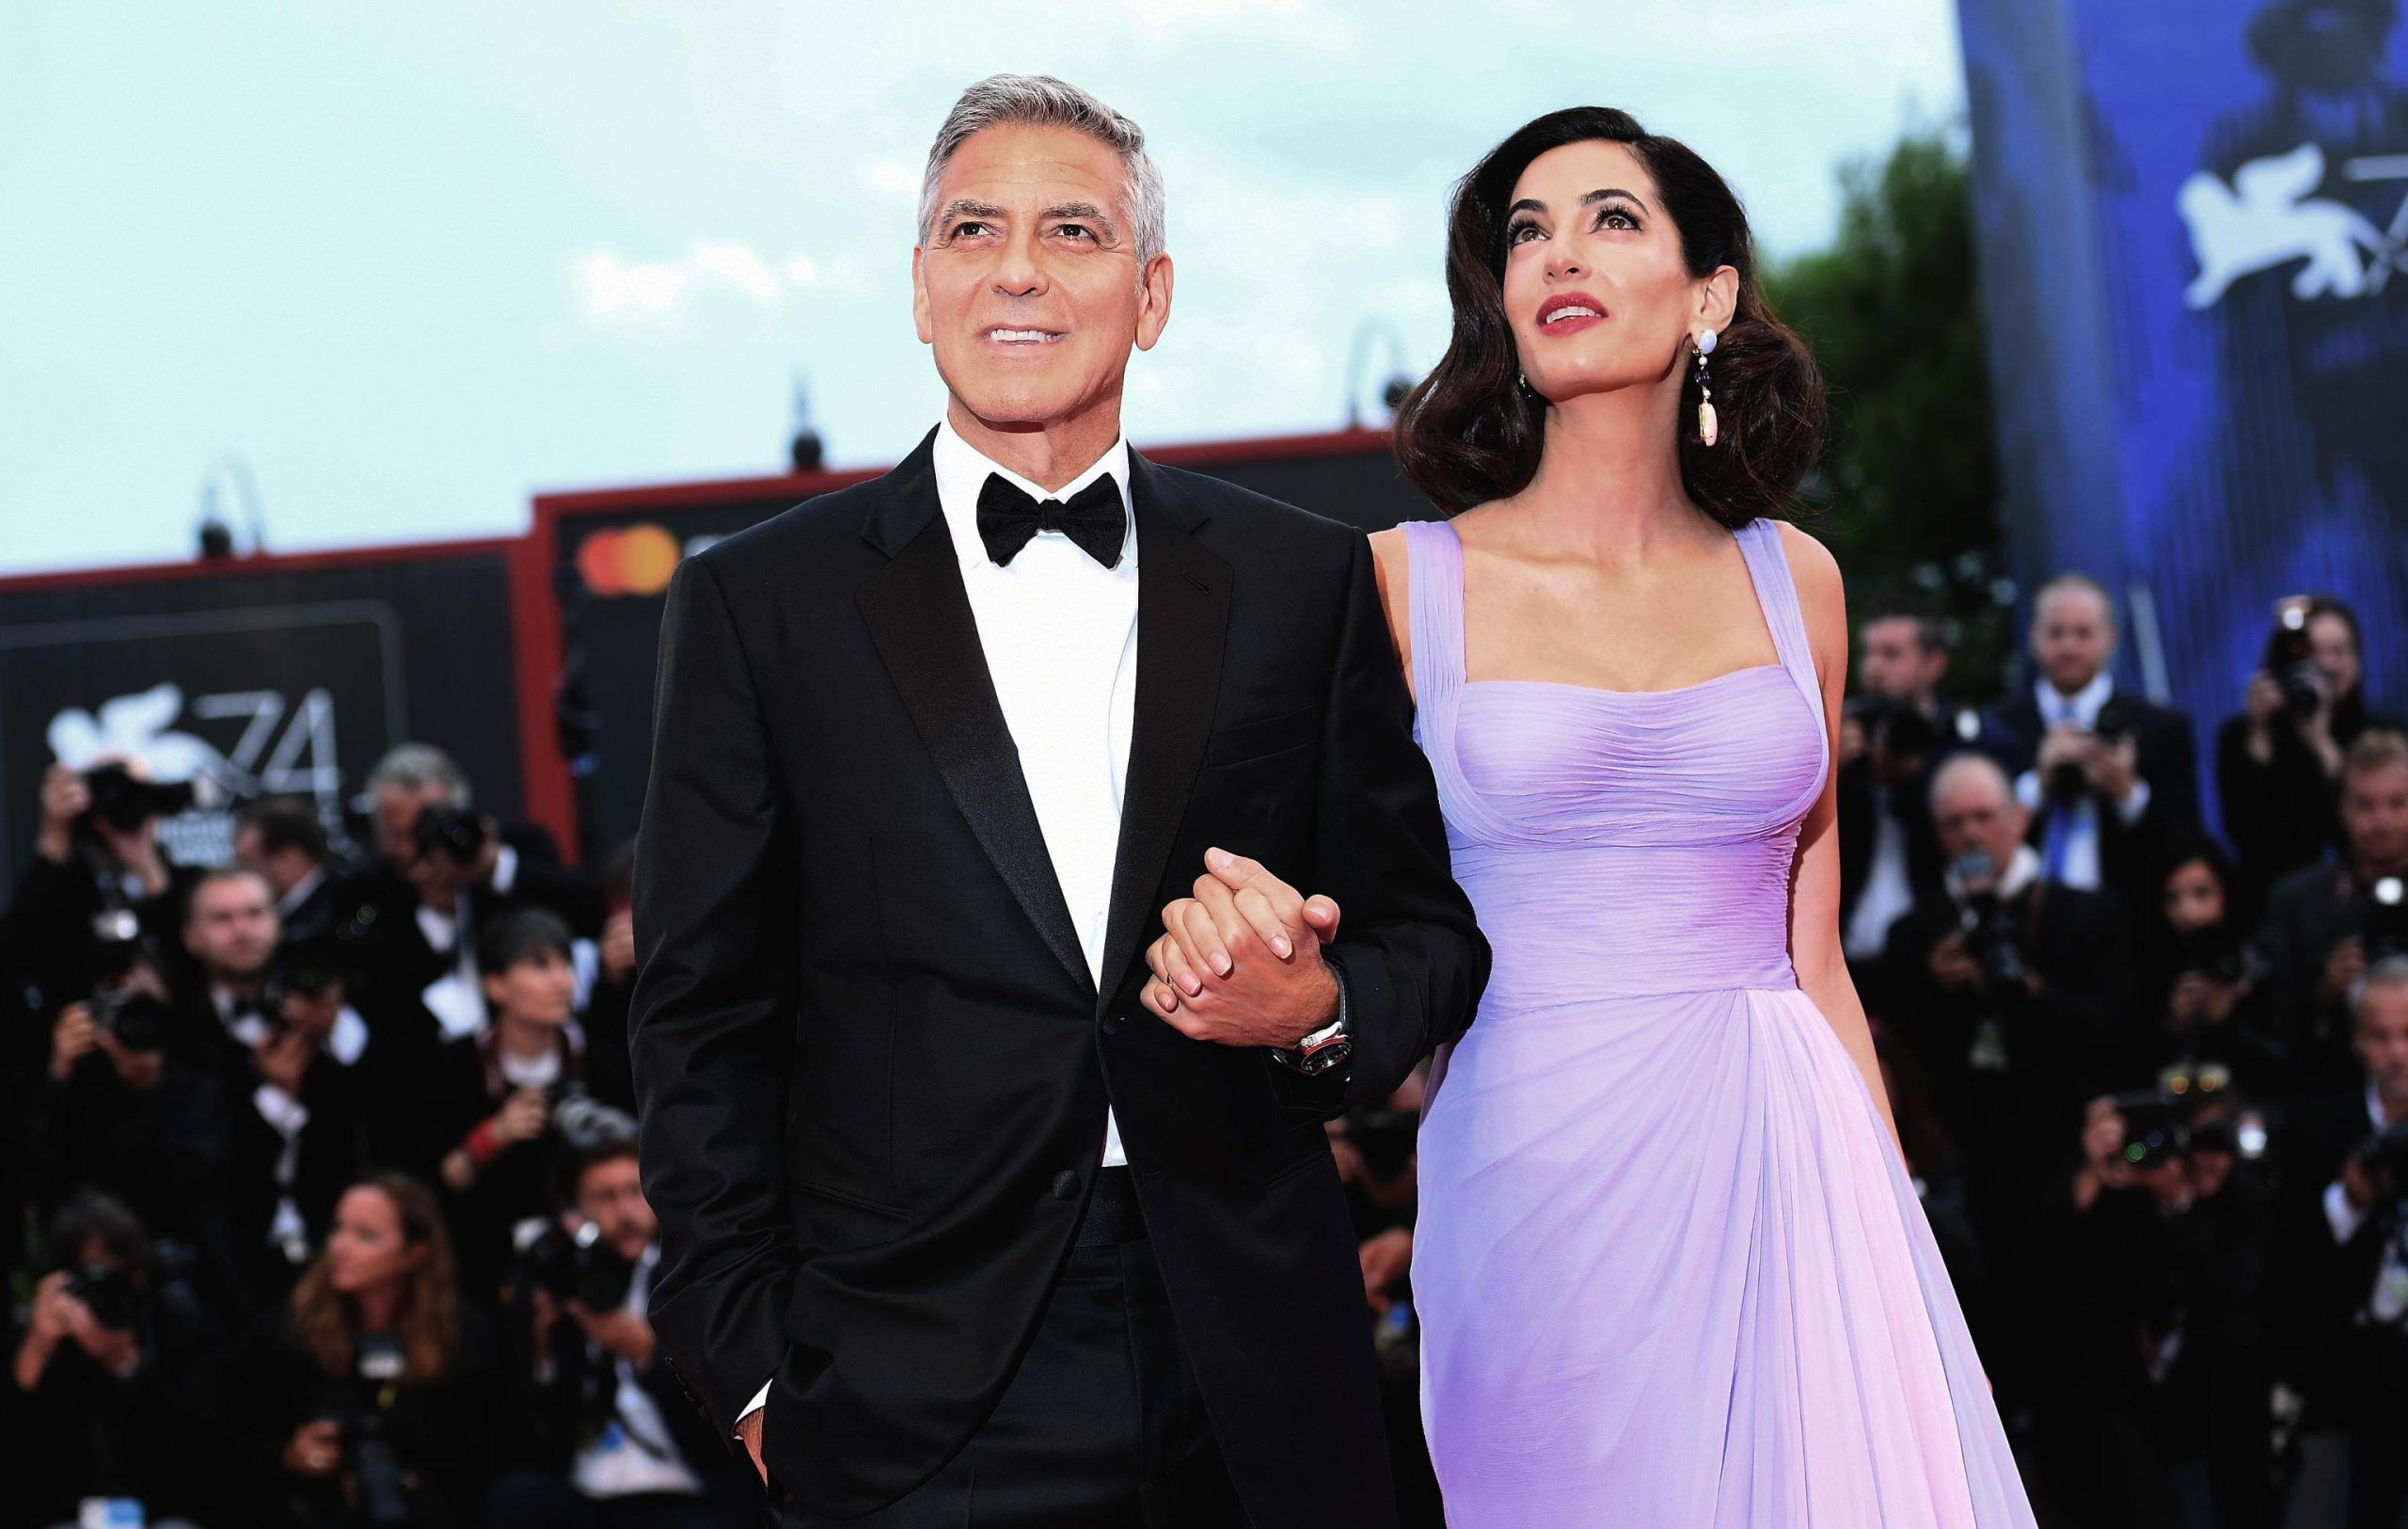 George Clooney parla dei gemelli: 'Alexander è un teppista, Ella somiglia ad Amal'